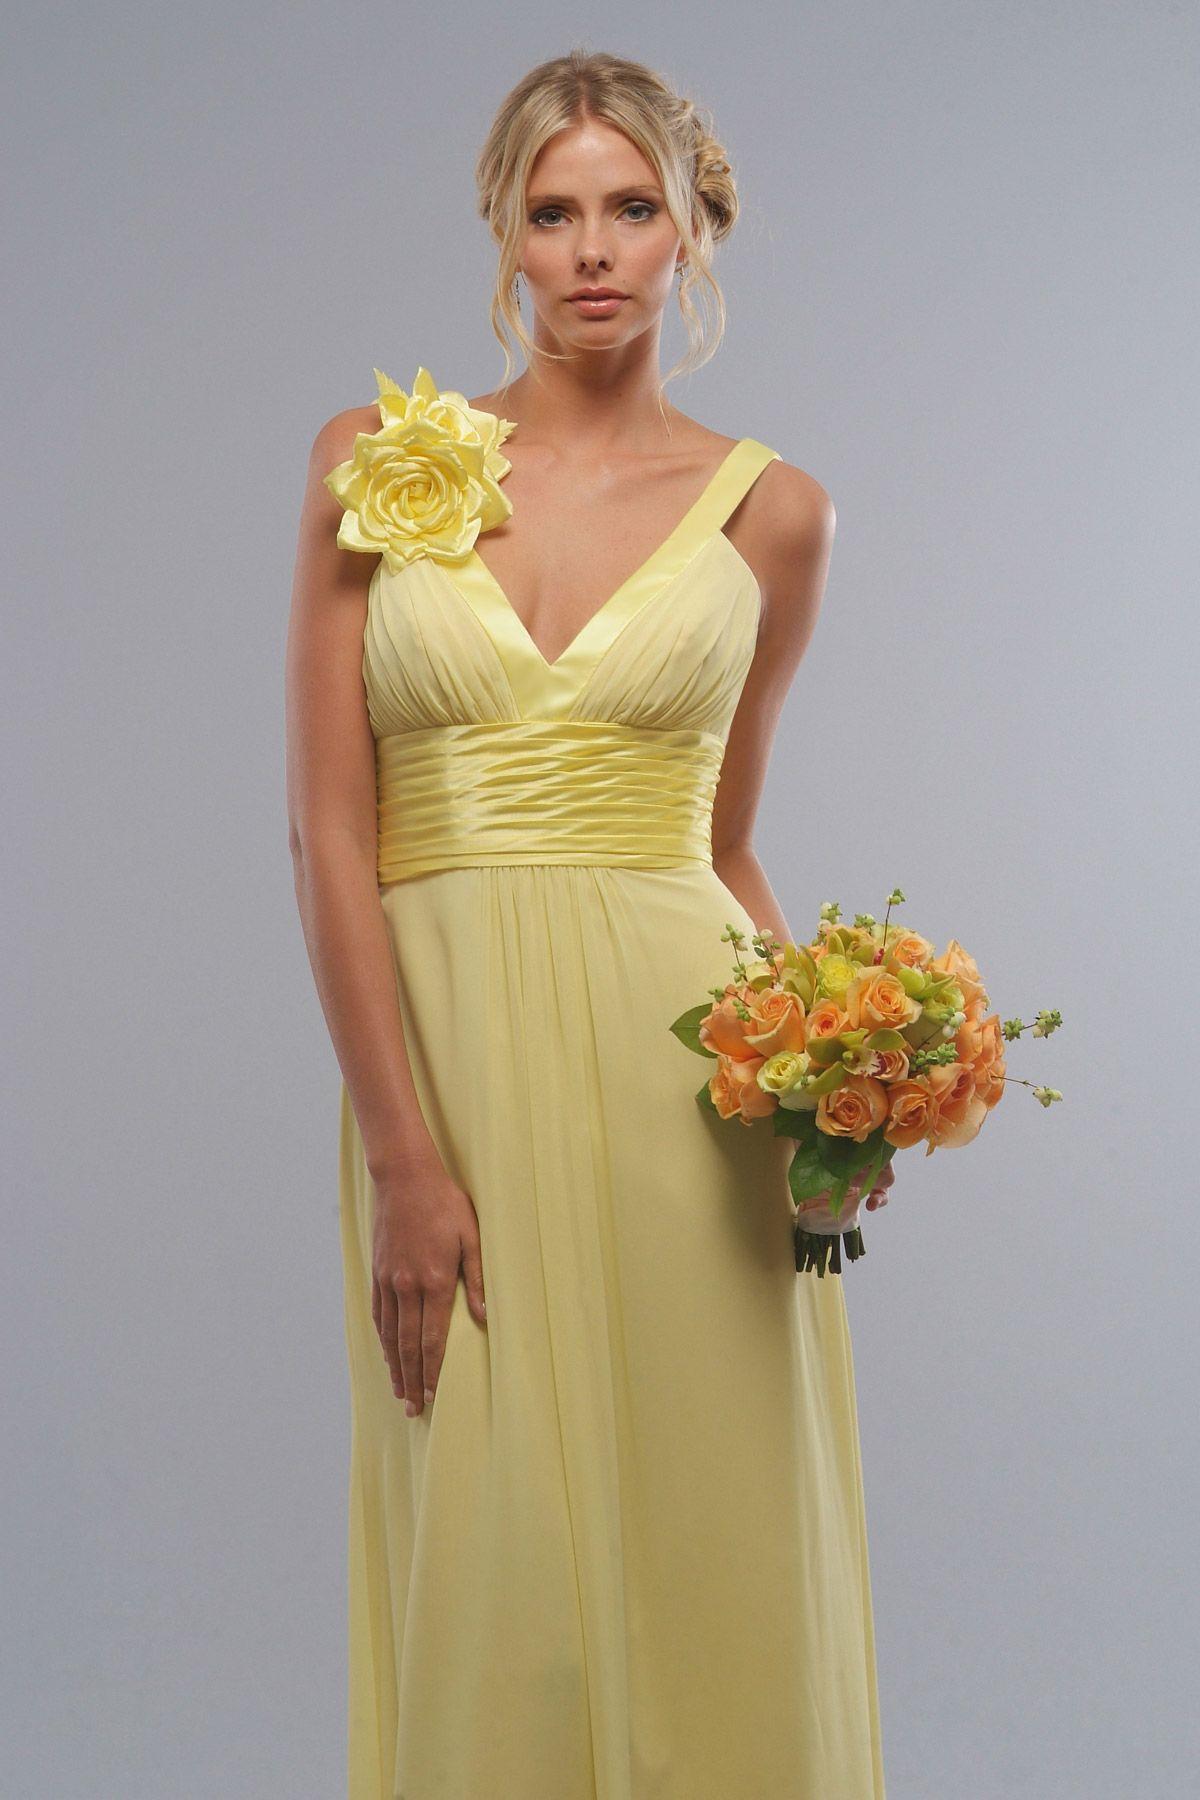 Natural wedding dresses  Beautiful sleeveless with natural waist dress for bridesmaids